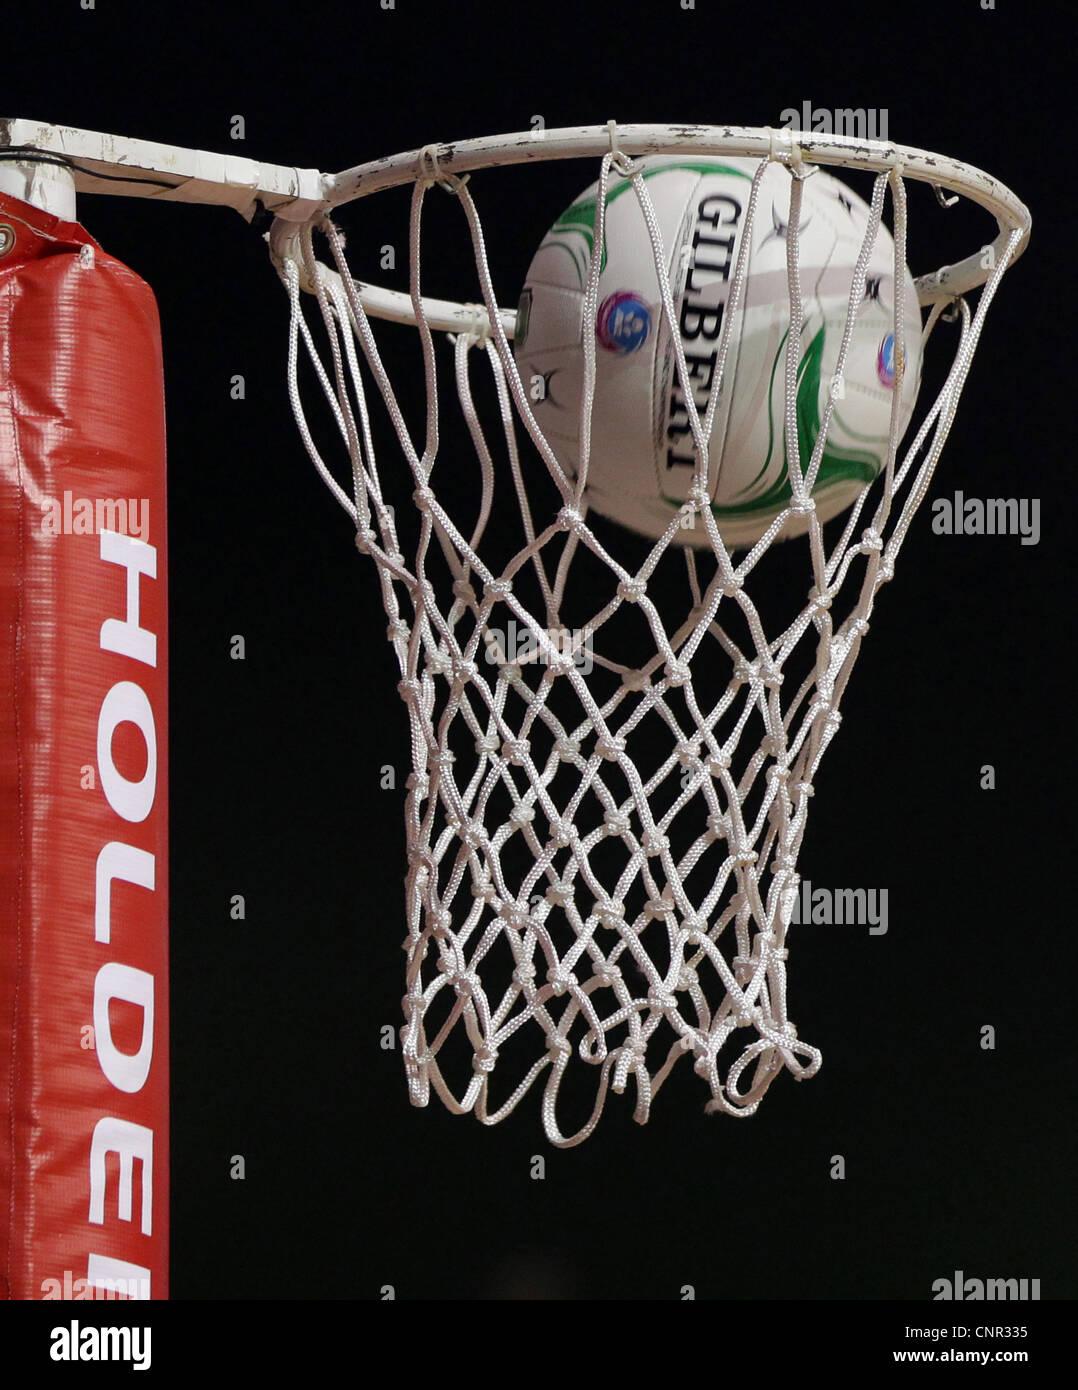 Le netball Hoop, Auckland, Nouvelle-Zélande, Dimanche, Avril 01, 2012. Photo Stock